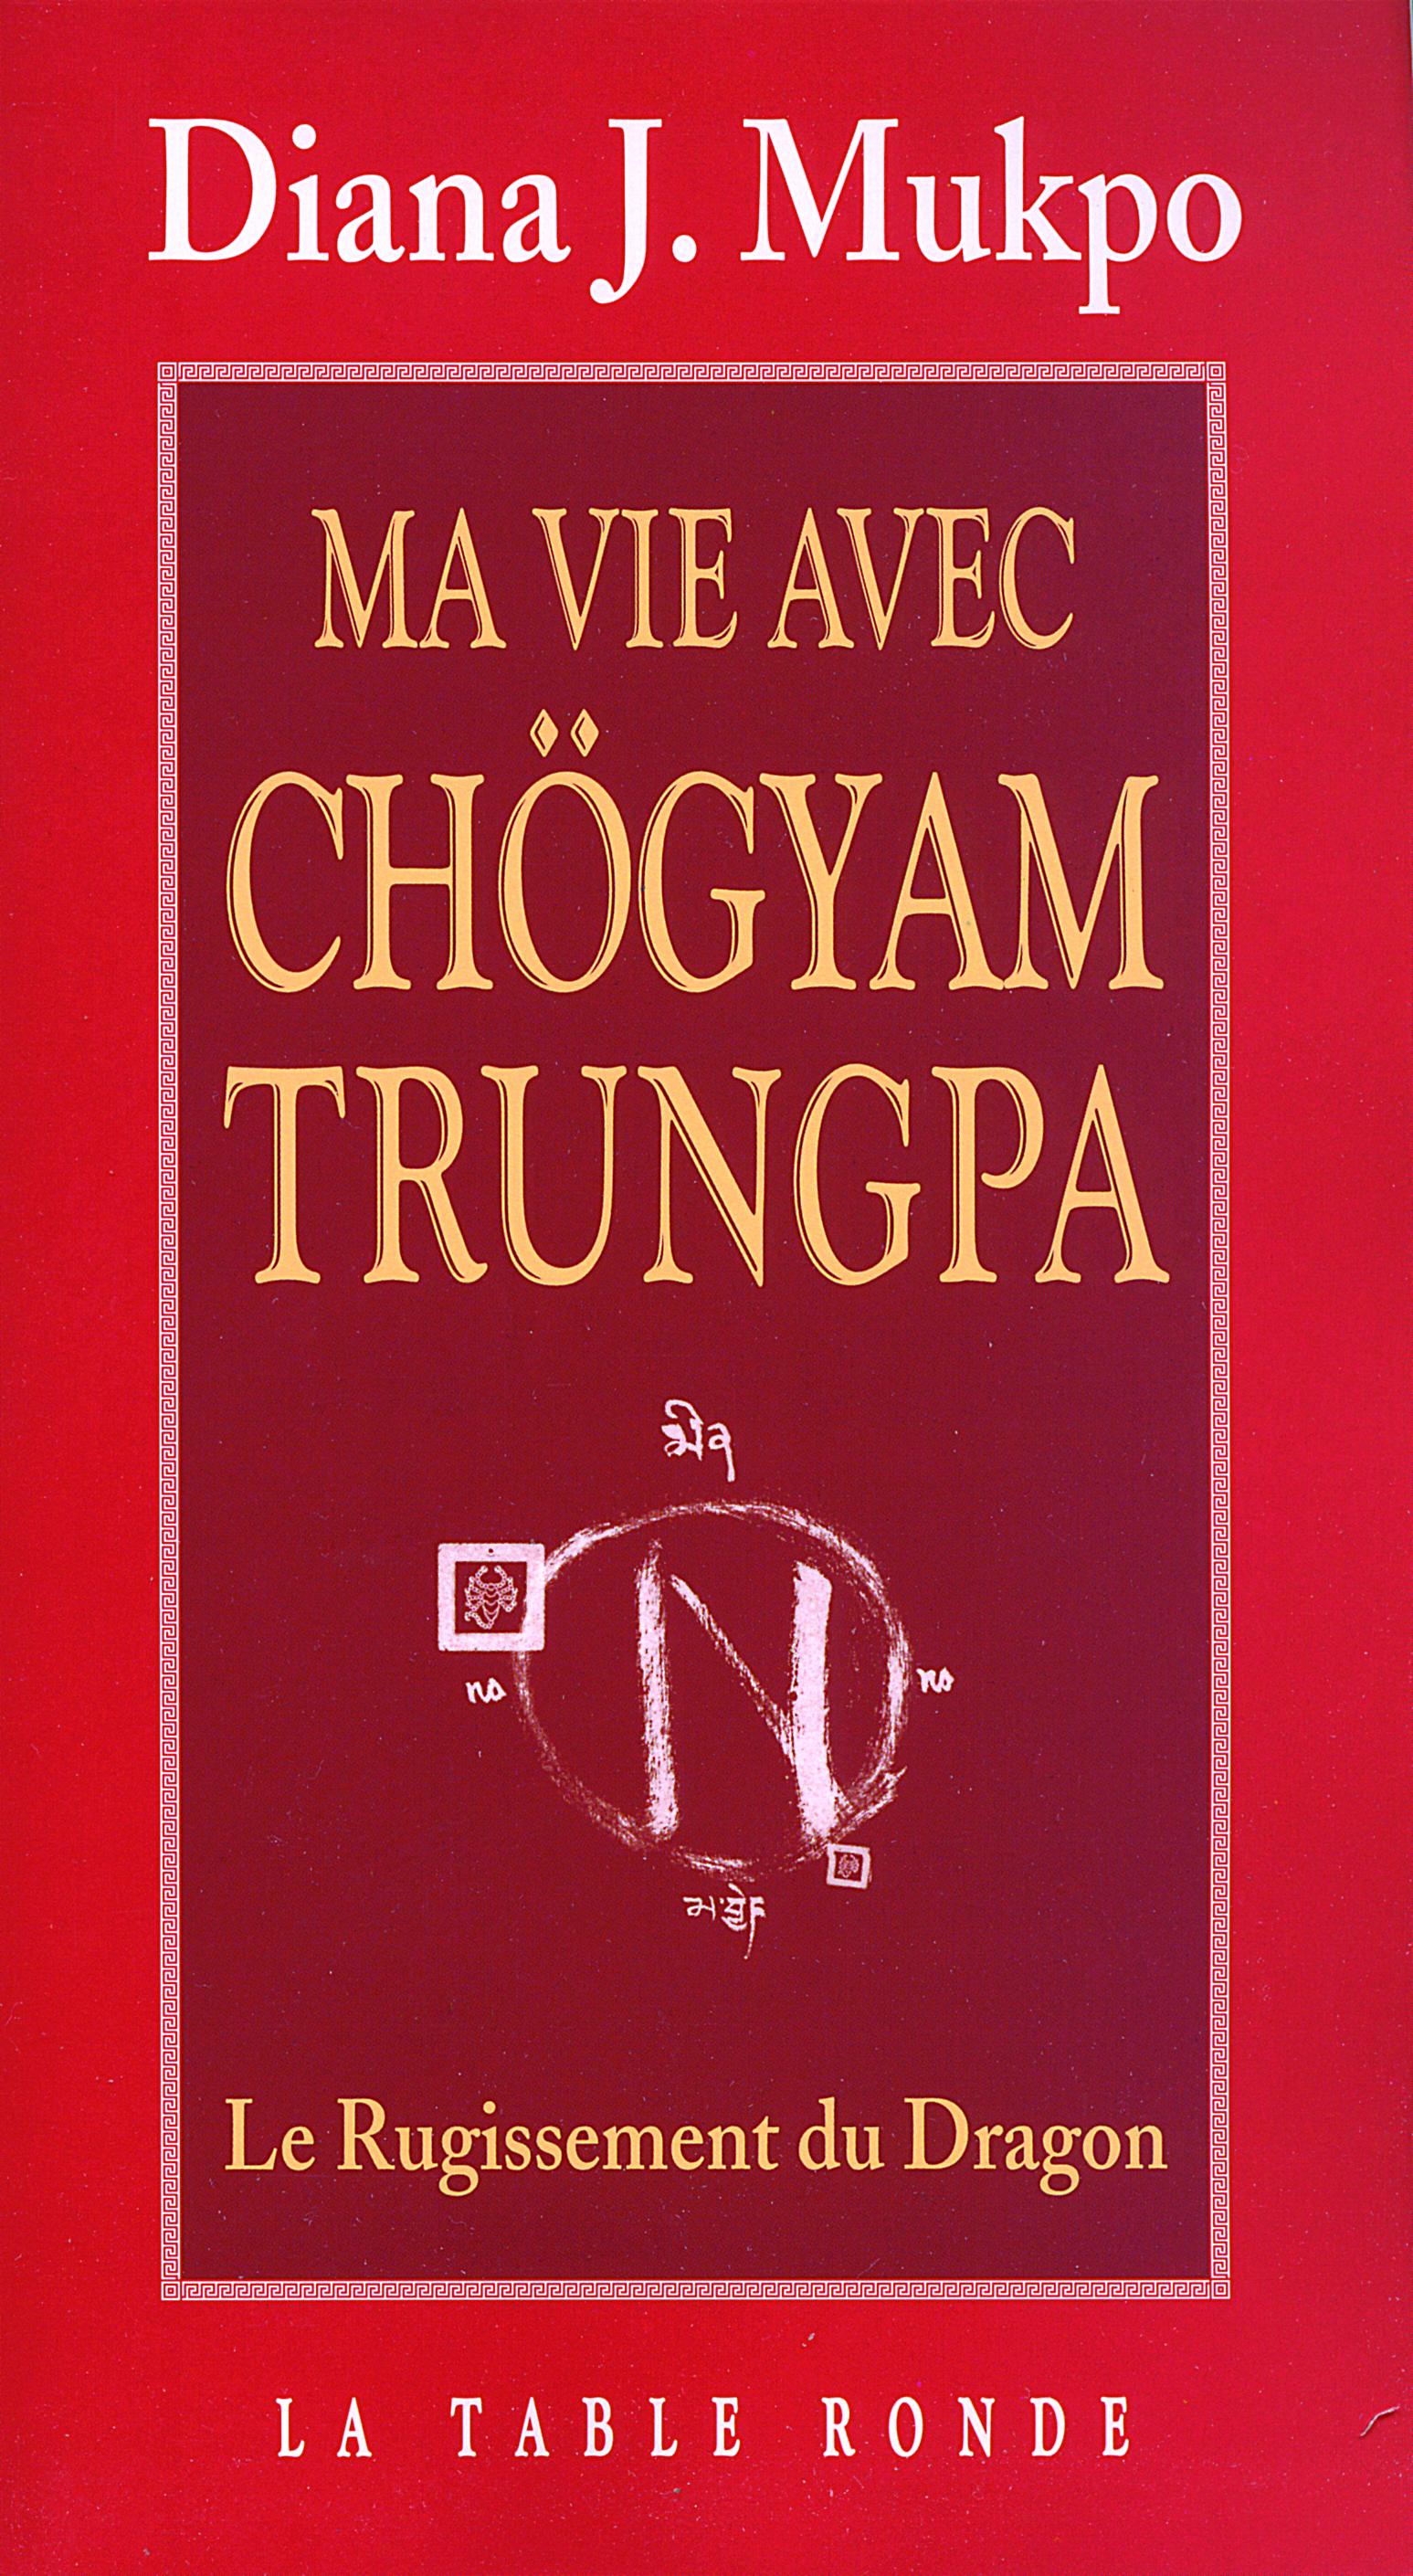 MA VIE AVEC CHOGYAM TRUNGPA - LE RUGISSEMENT DU DRAGON